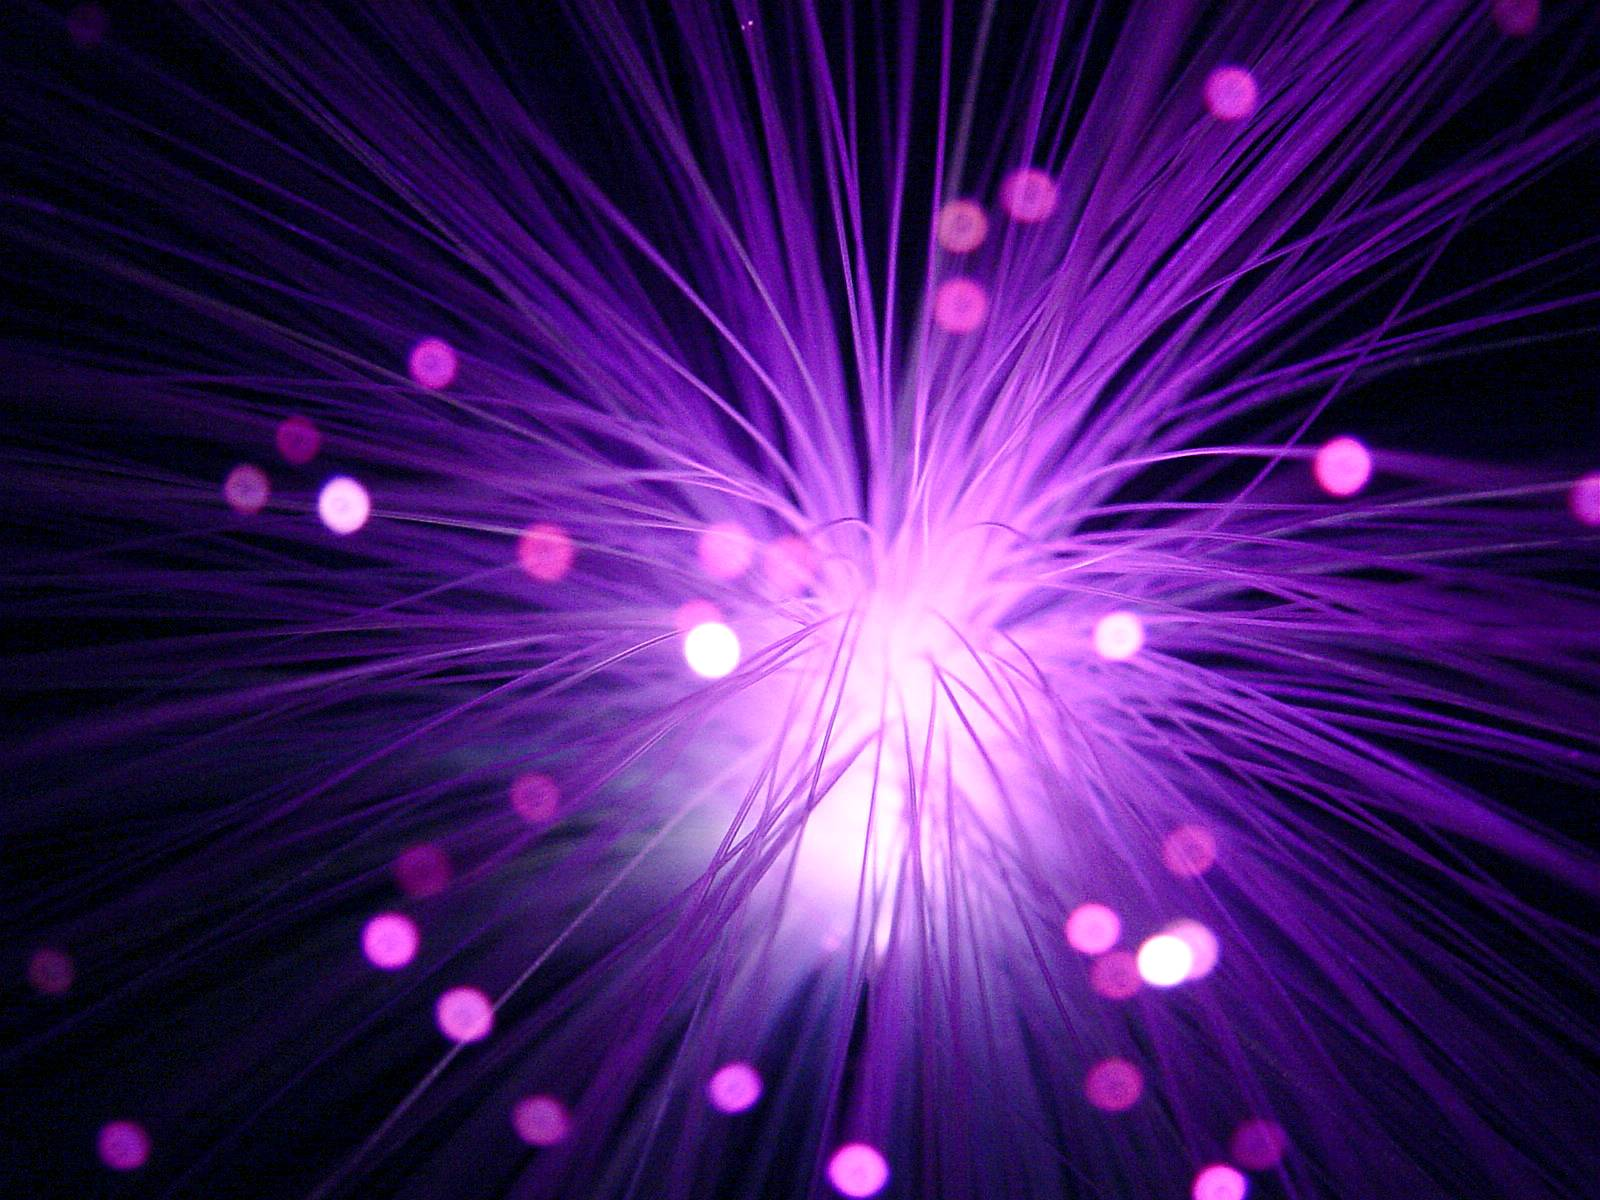 Desktop Backgrounds 4U Purple Backgrounds 1600x1200